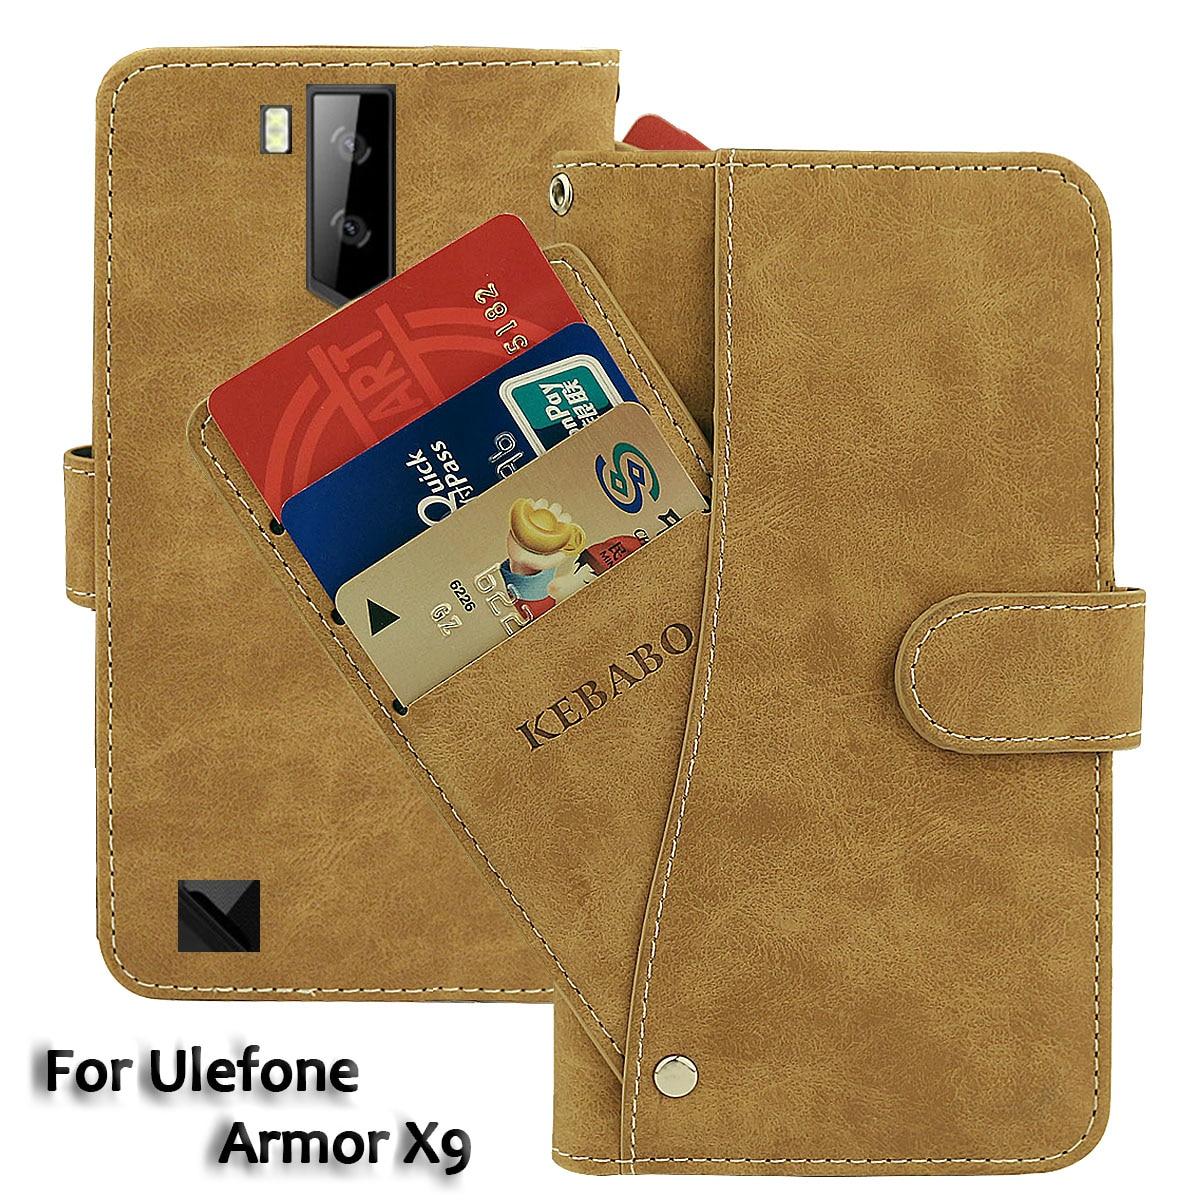 Vintage Leather Wallet Ulefone Armor X9 Case 5.5